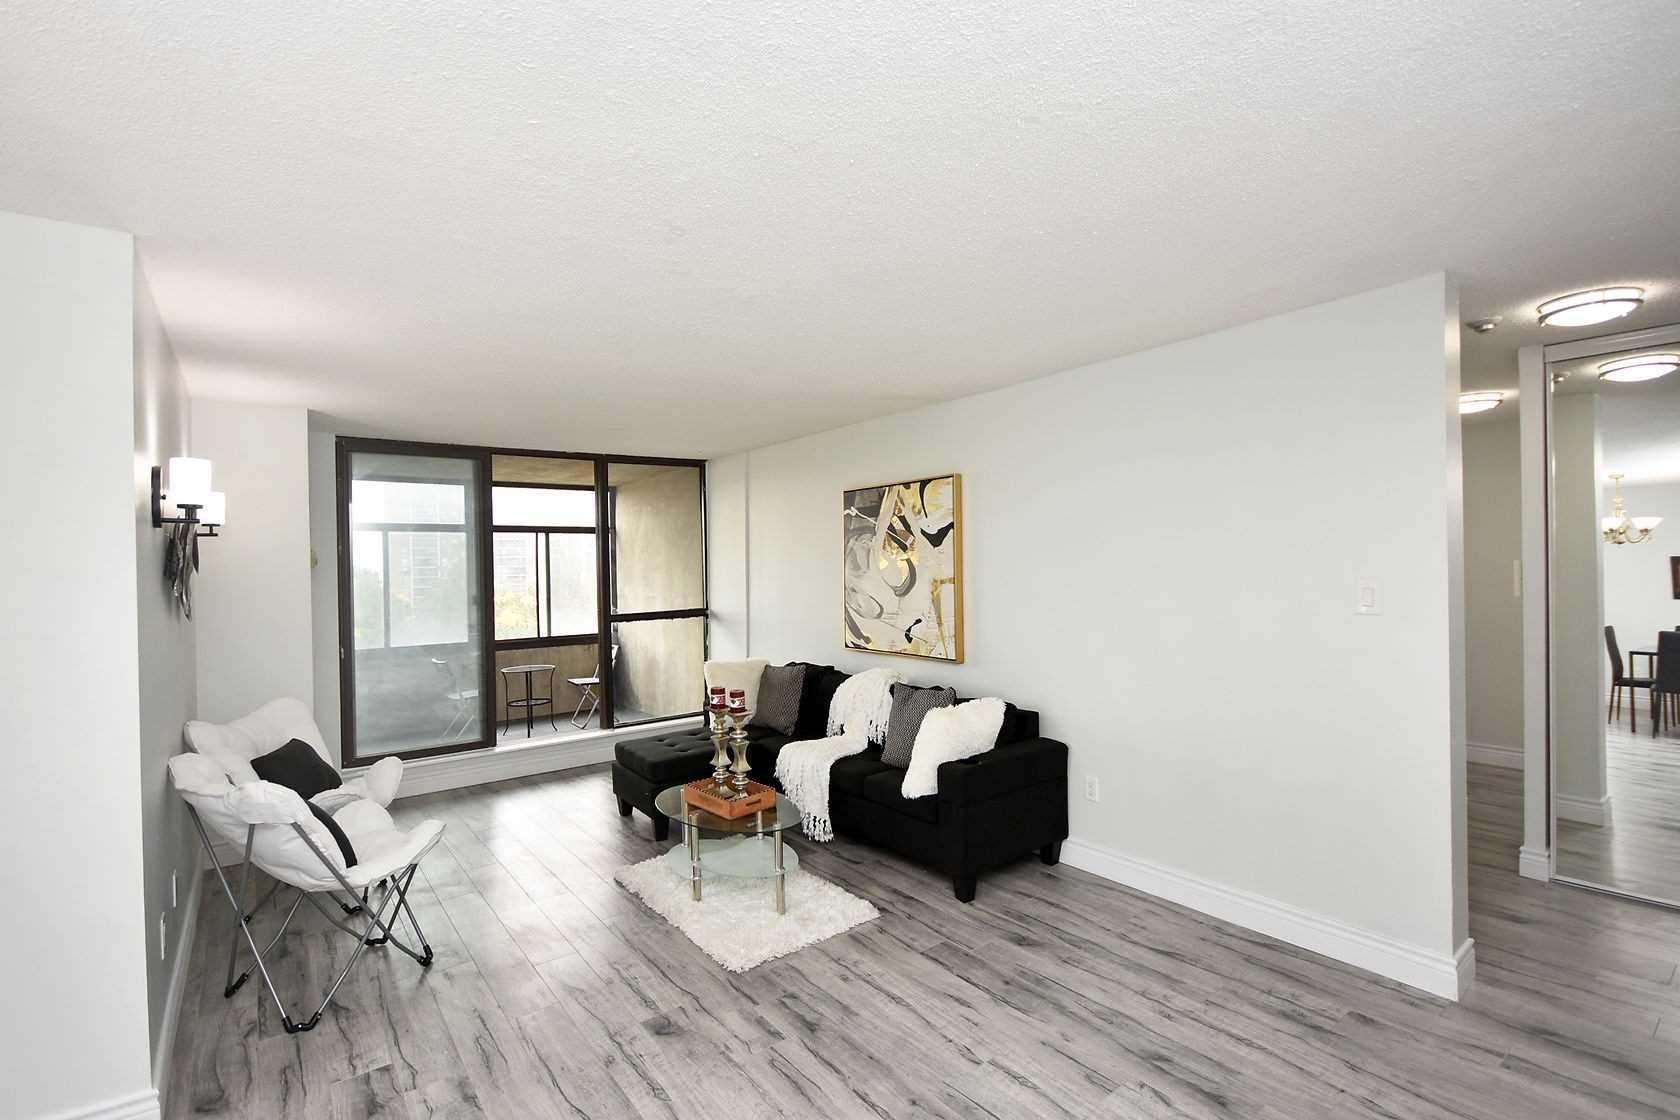 #501 - 25 Kensington Rd, Brampton